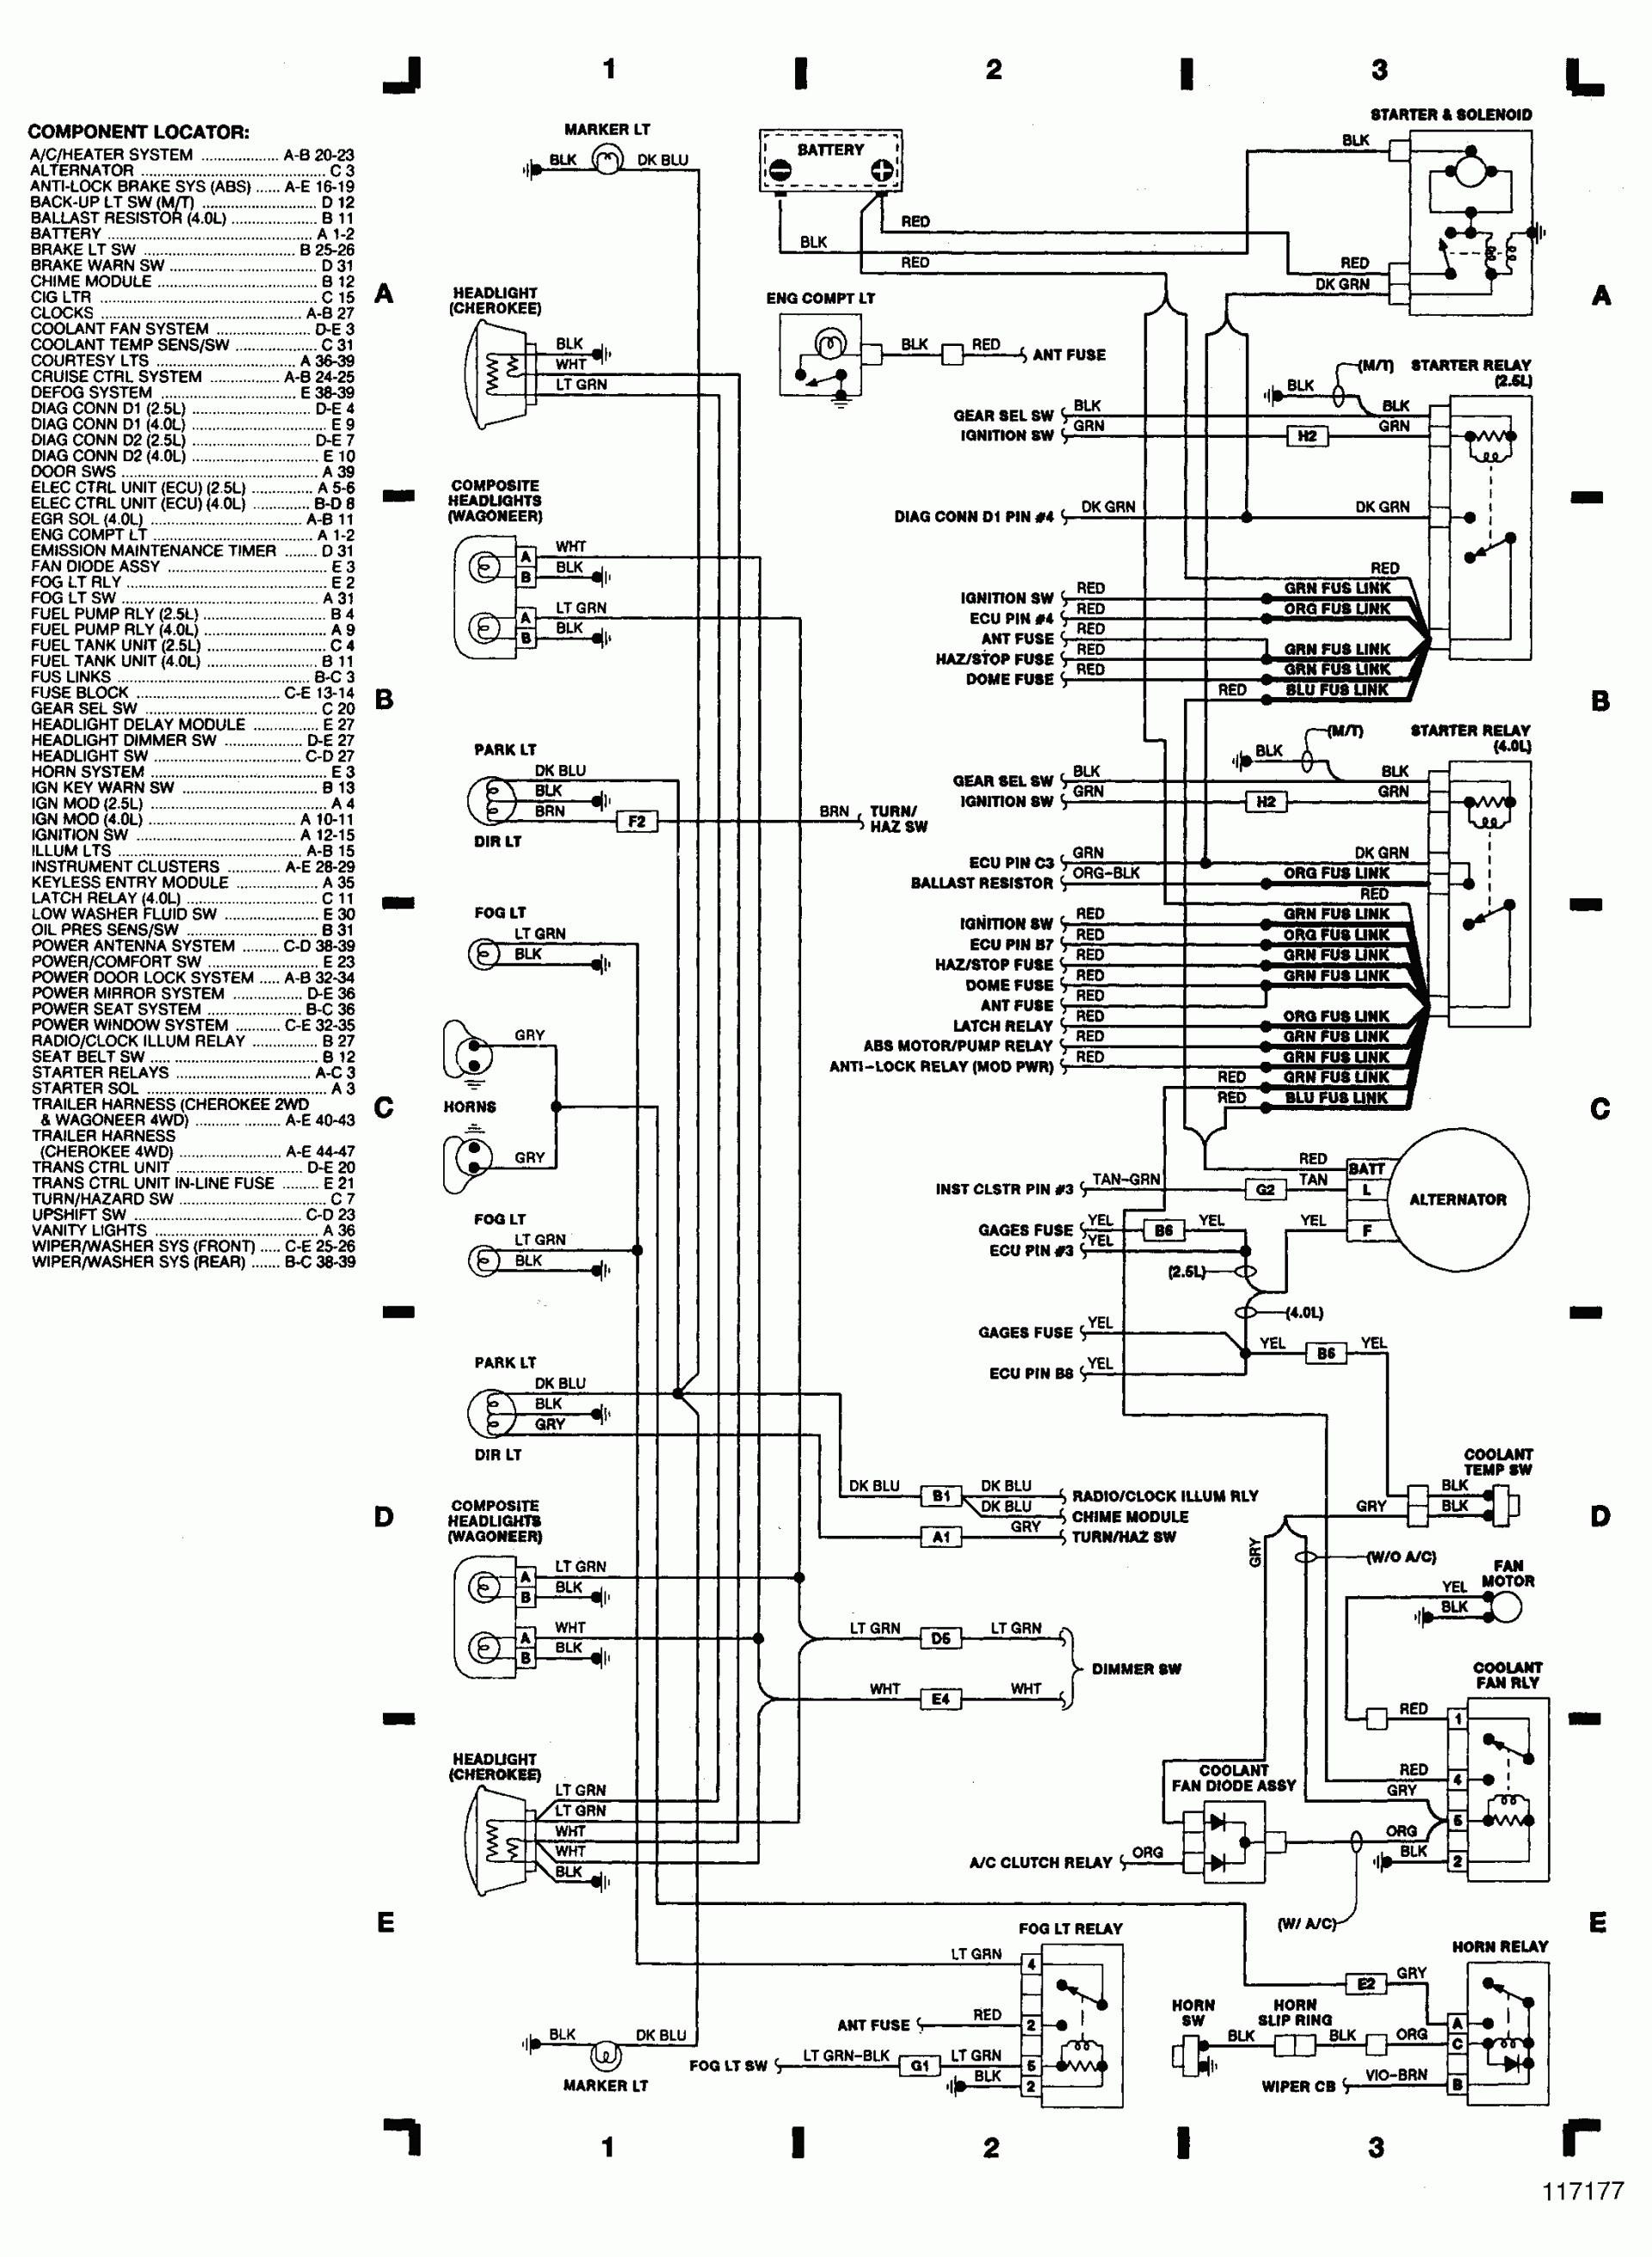 John Deere Parts Manual